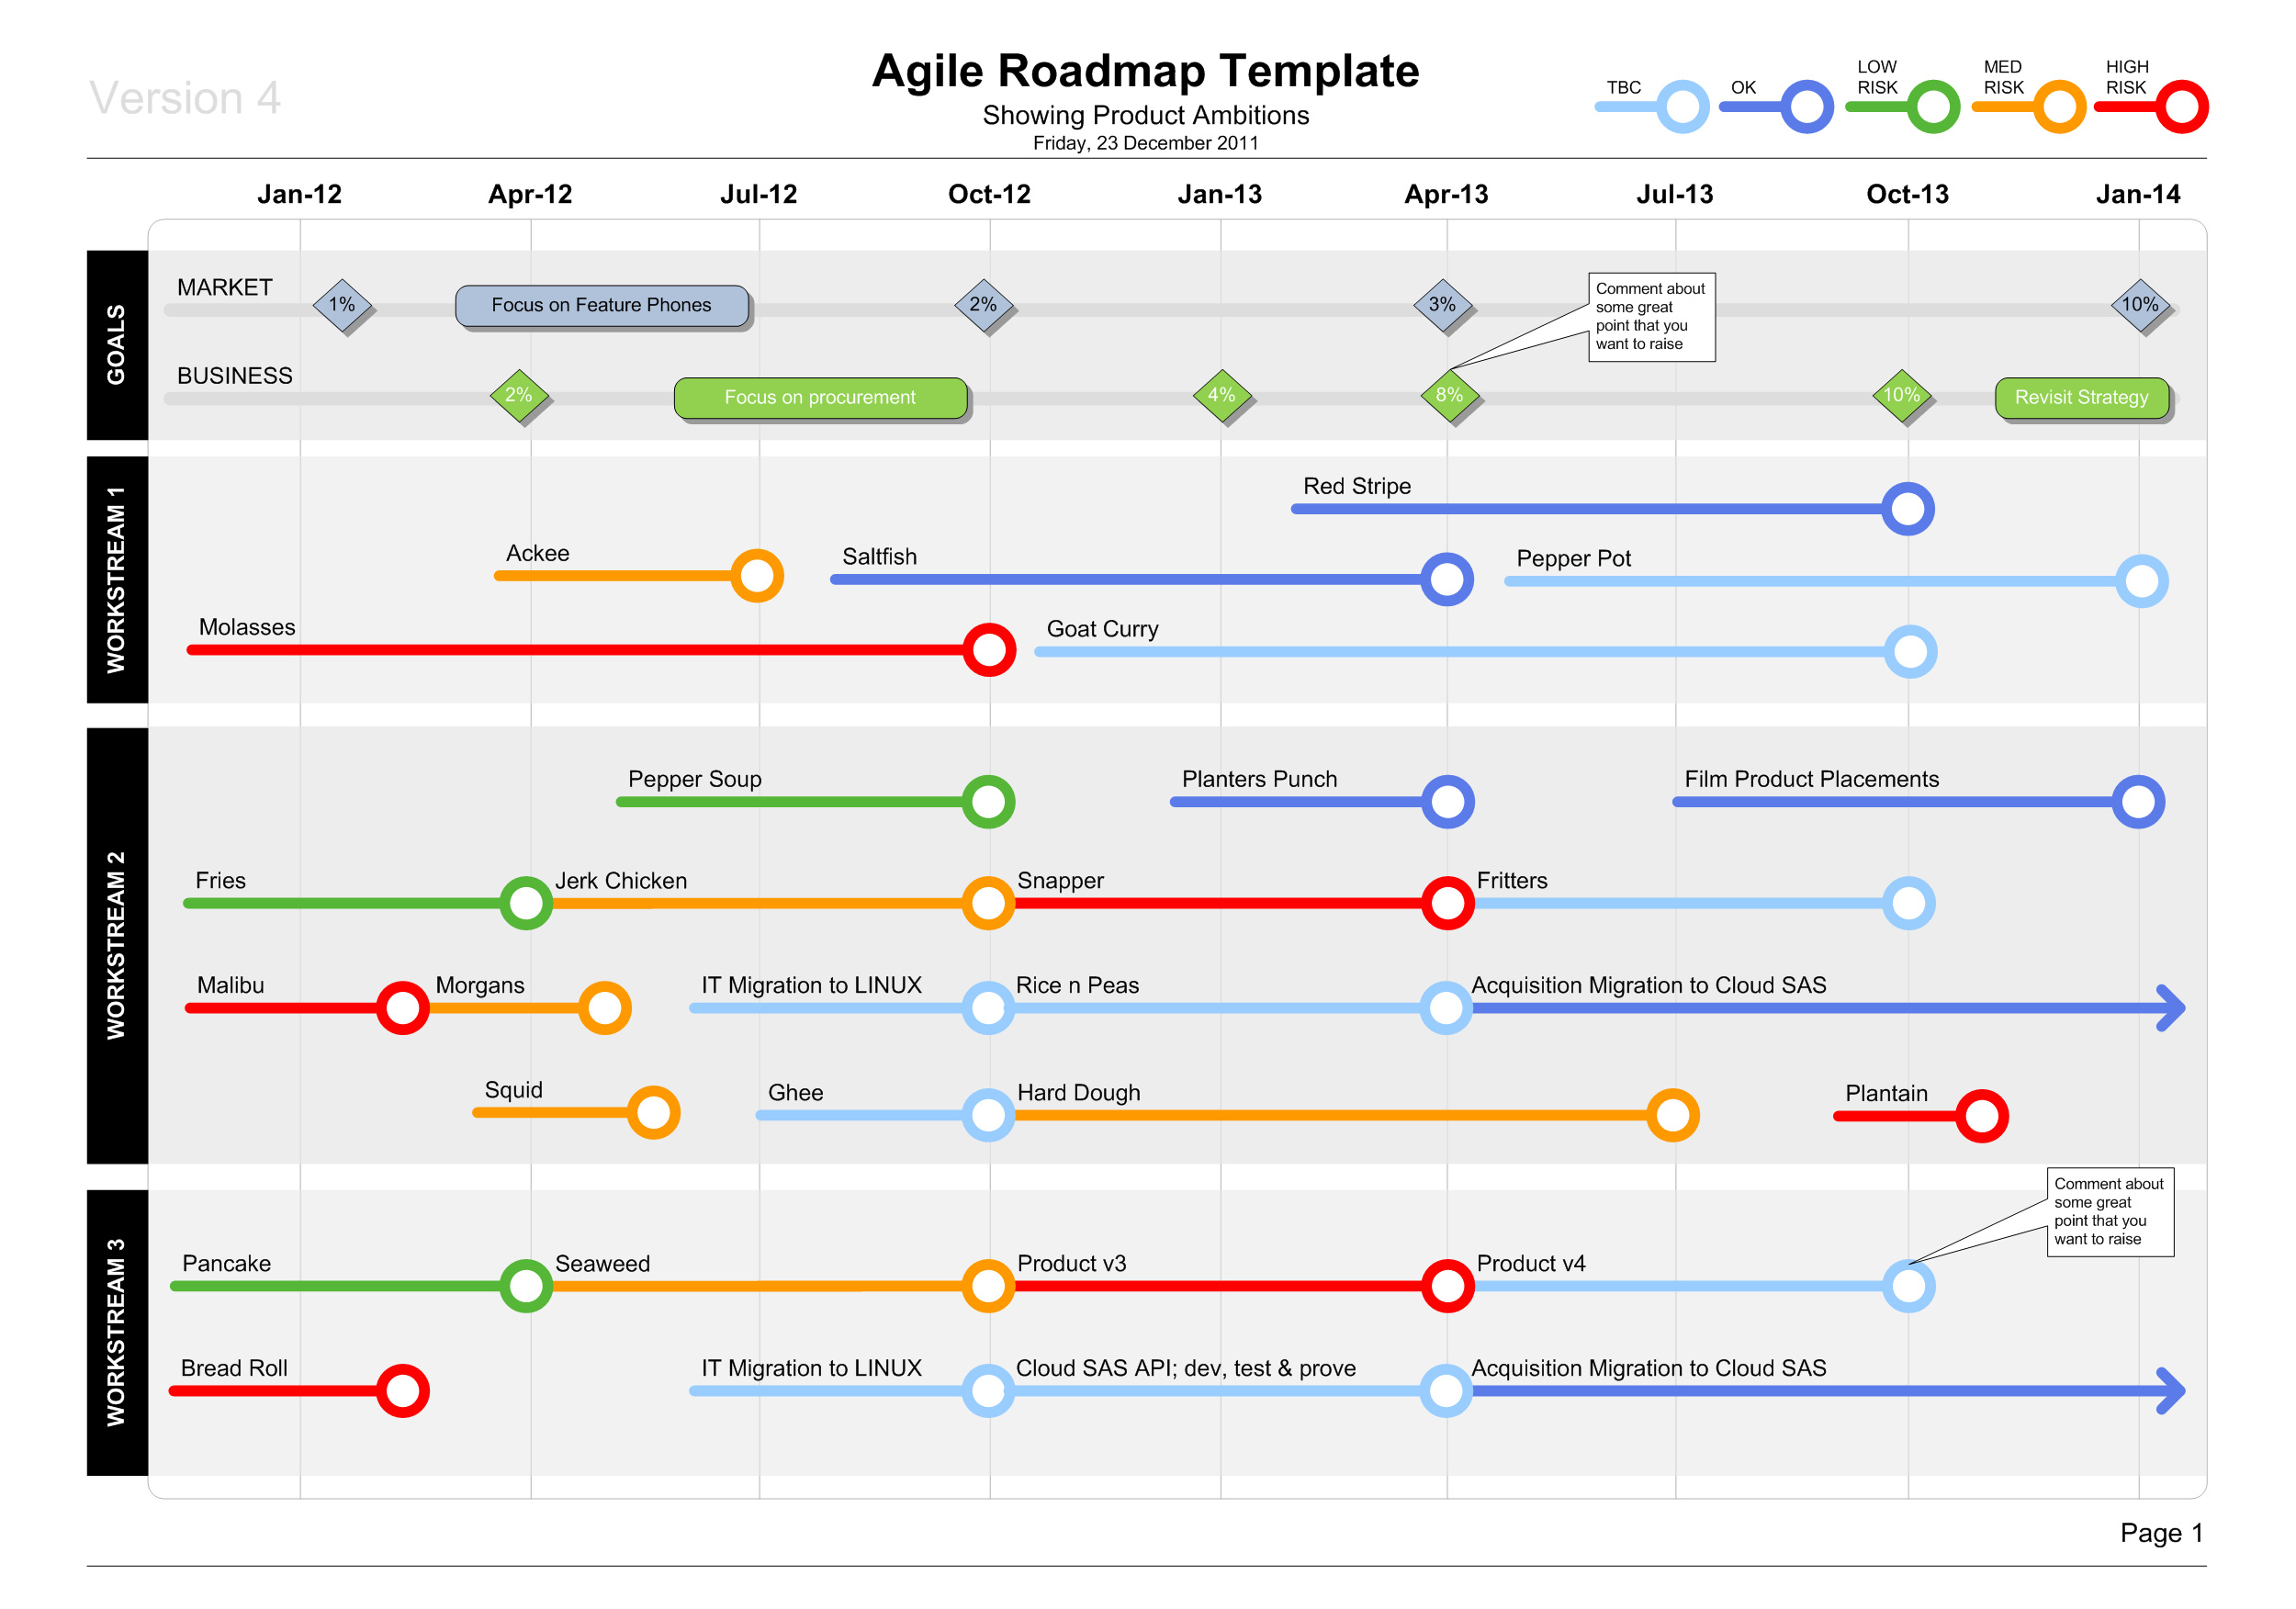 Agile Spreadsheet Template In Marketing Roadmap Template Excel Lovely Agile Roadmap Template Visio